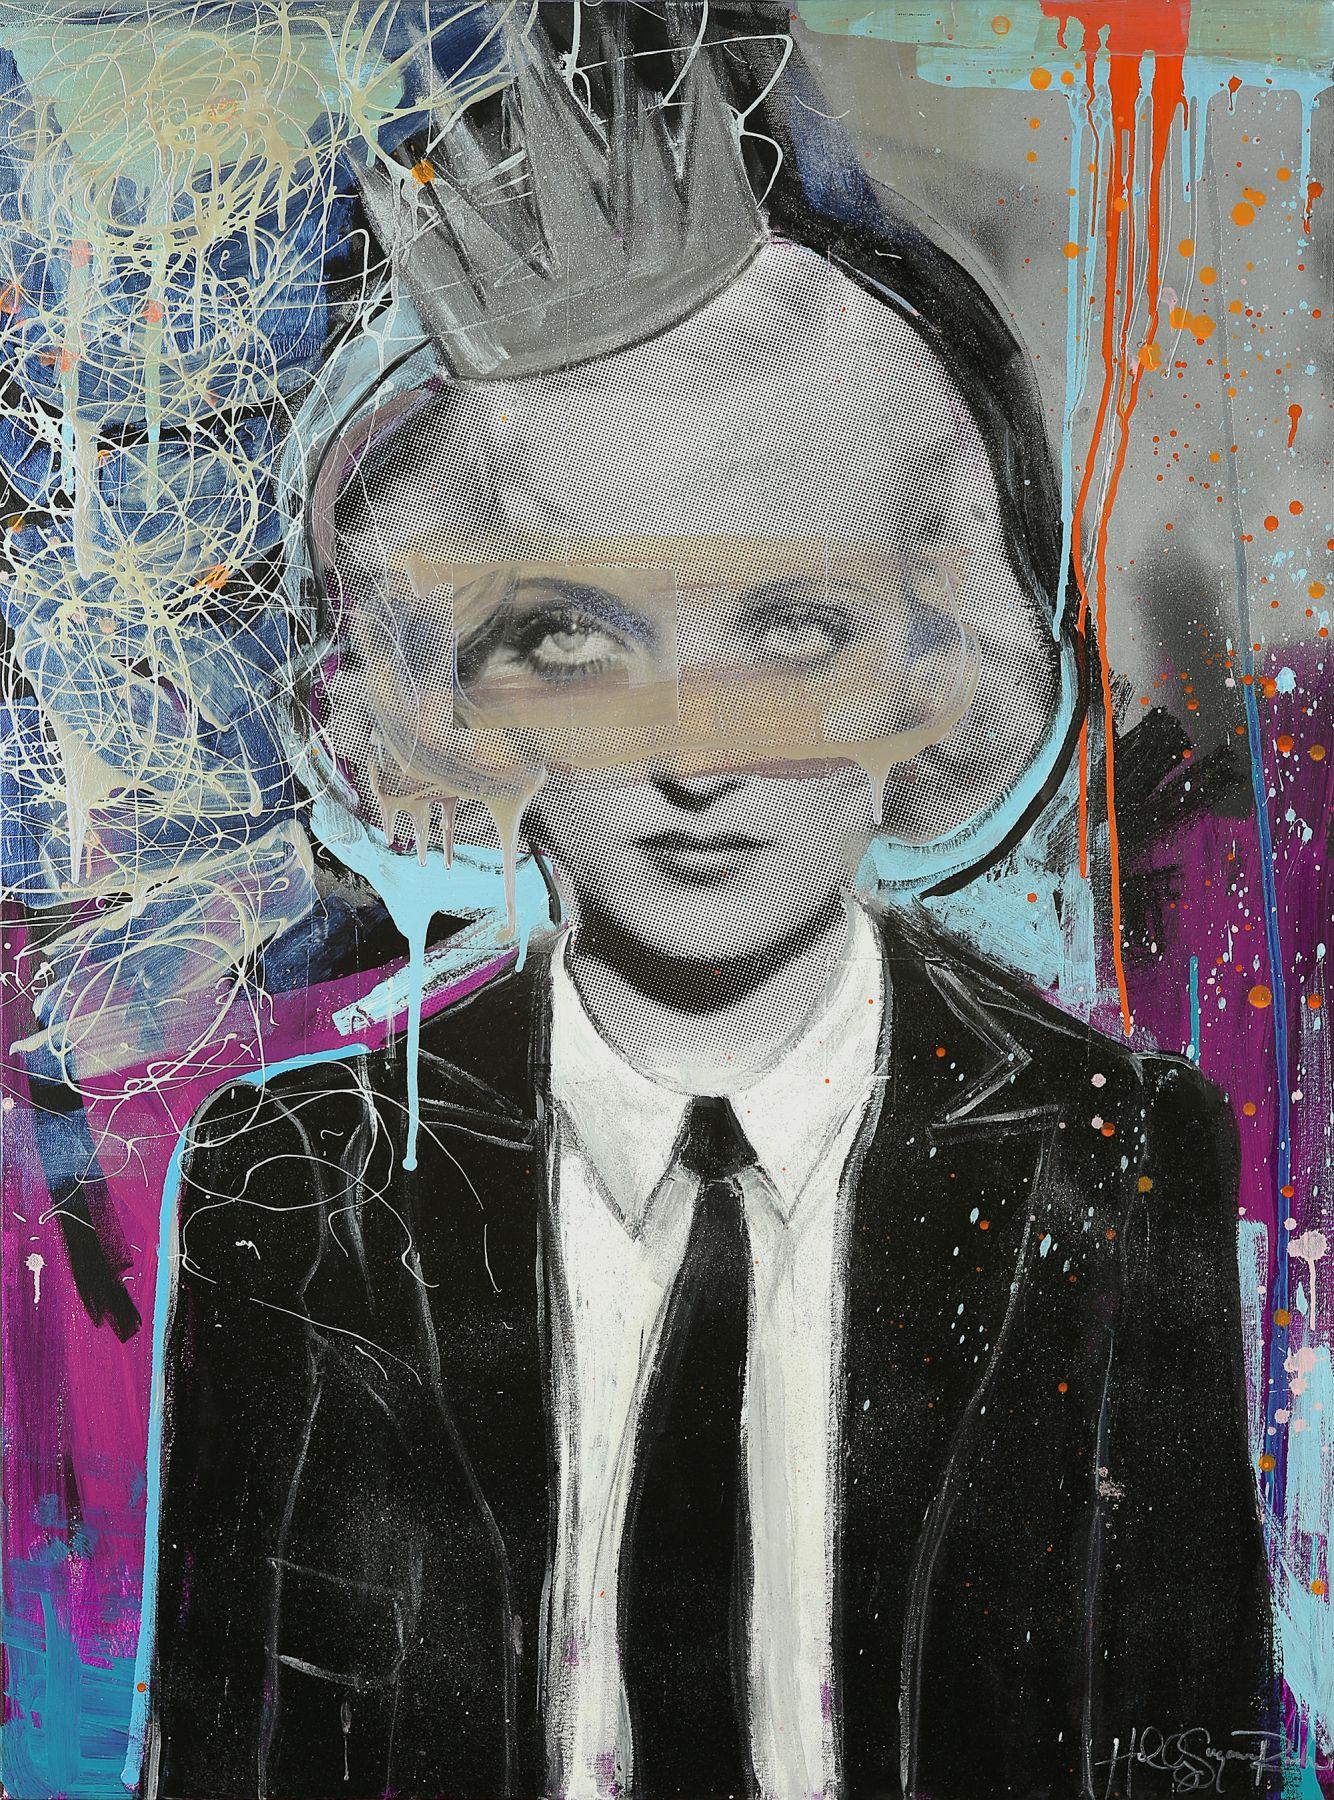 Queen Carol by Holly Suzanne Rader